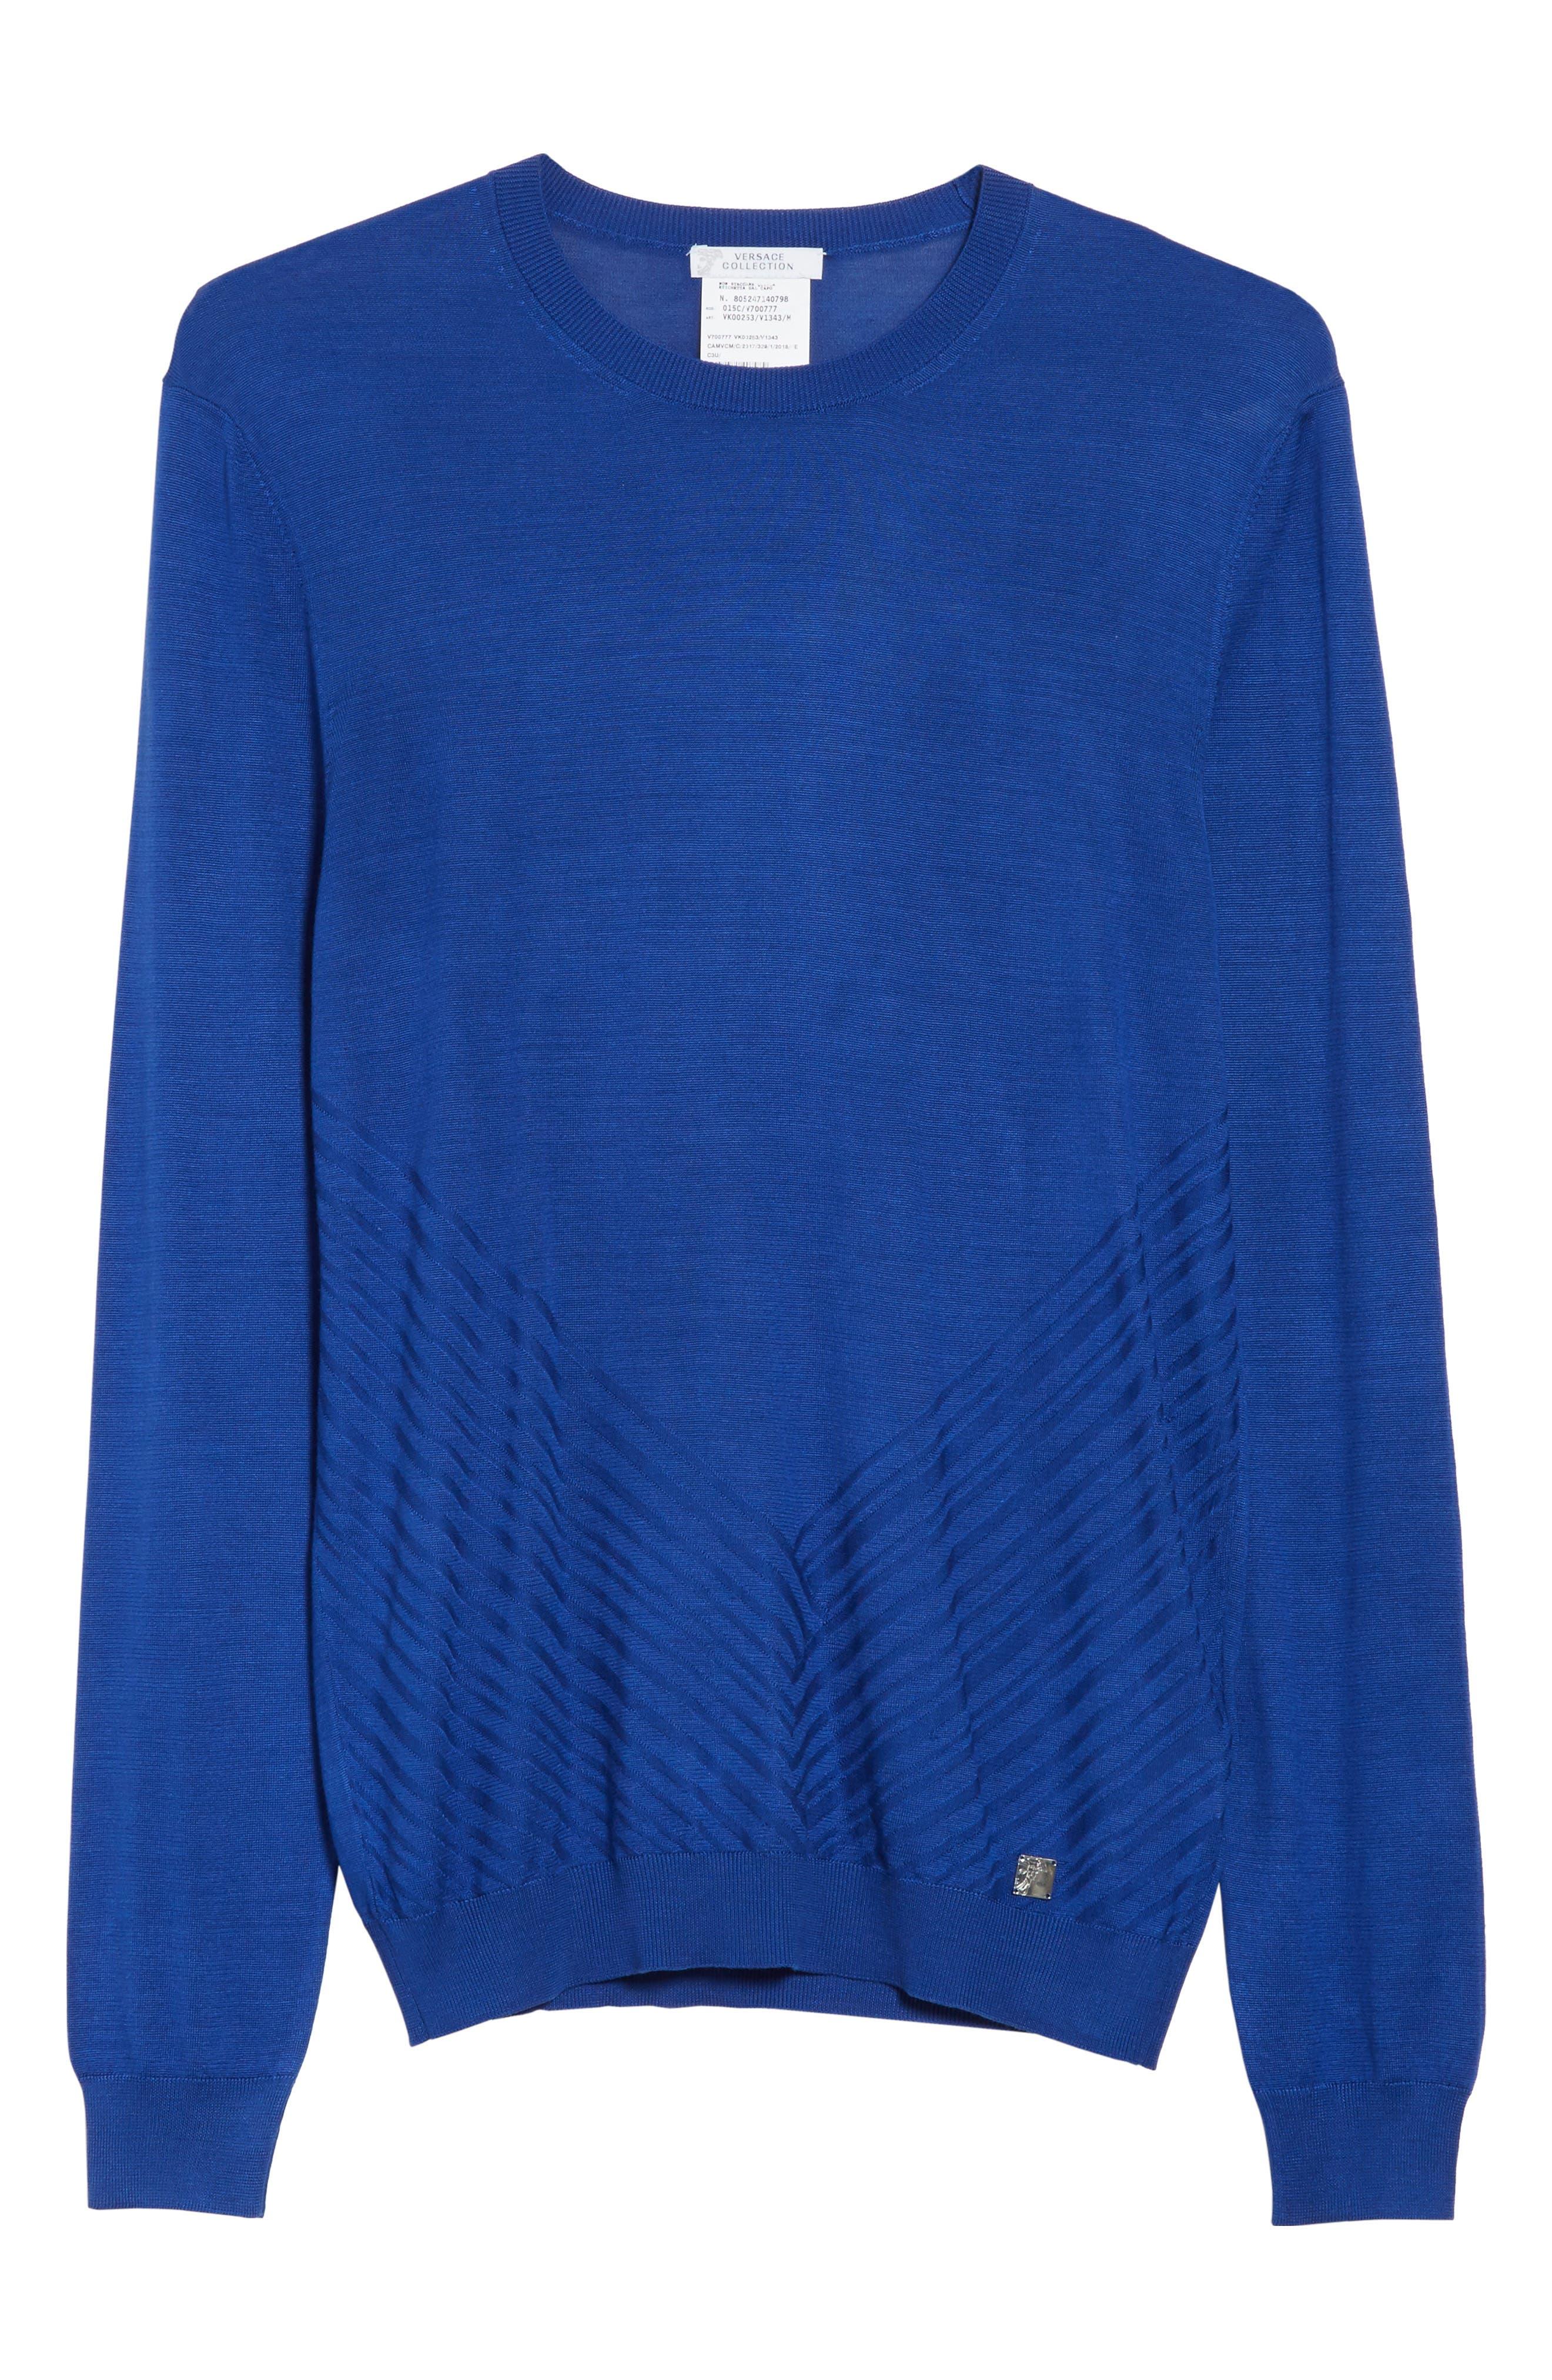 Silk Crewneck Sweater,                             Alternate thumbnail 6, color,                             430